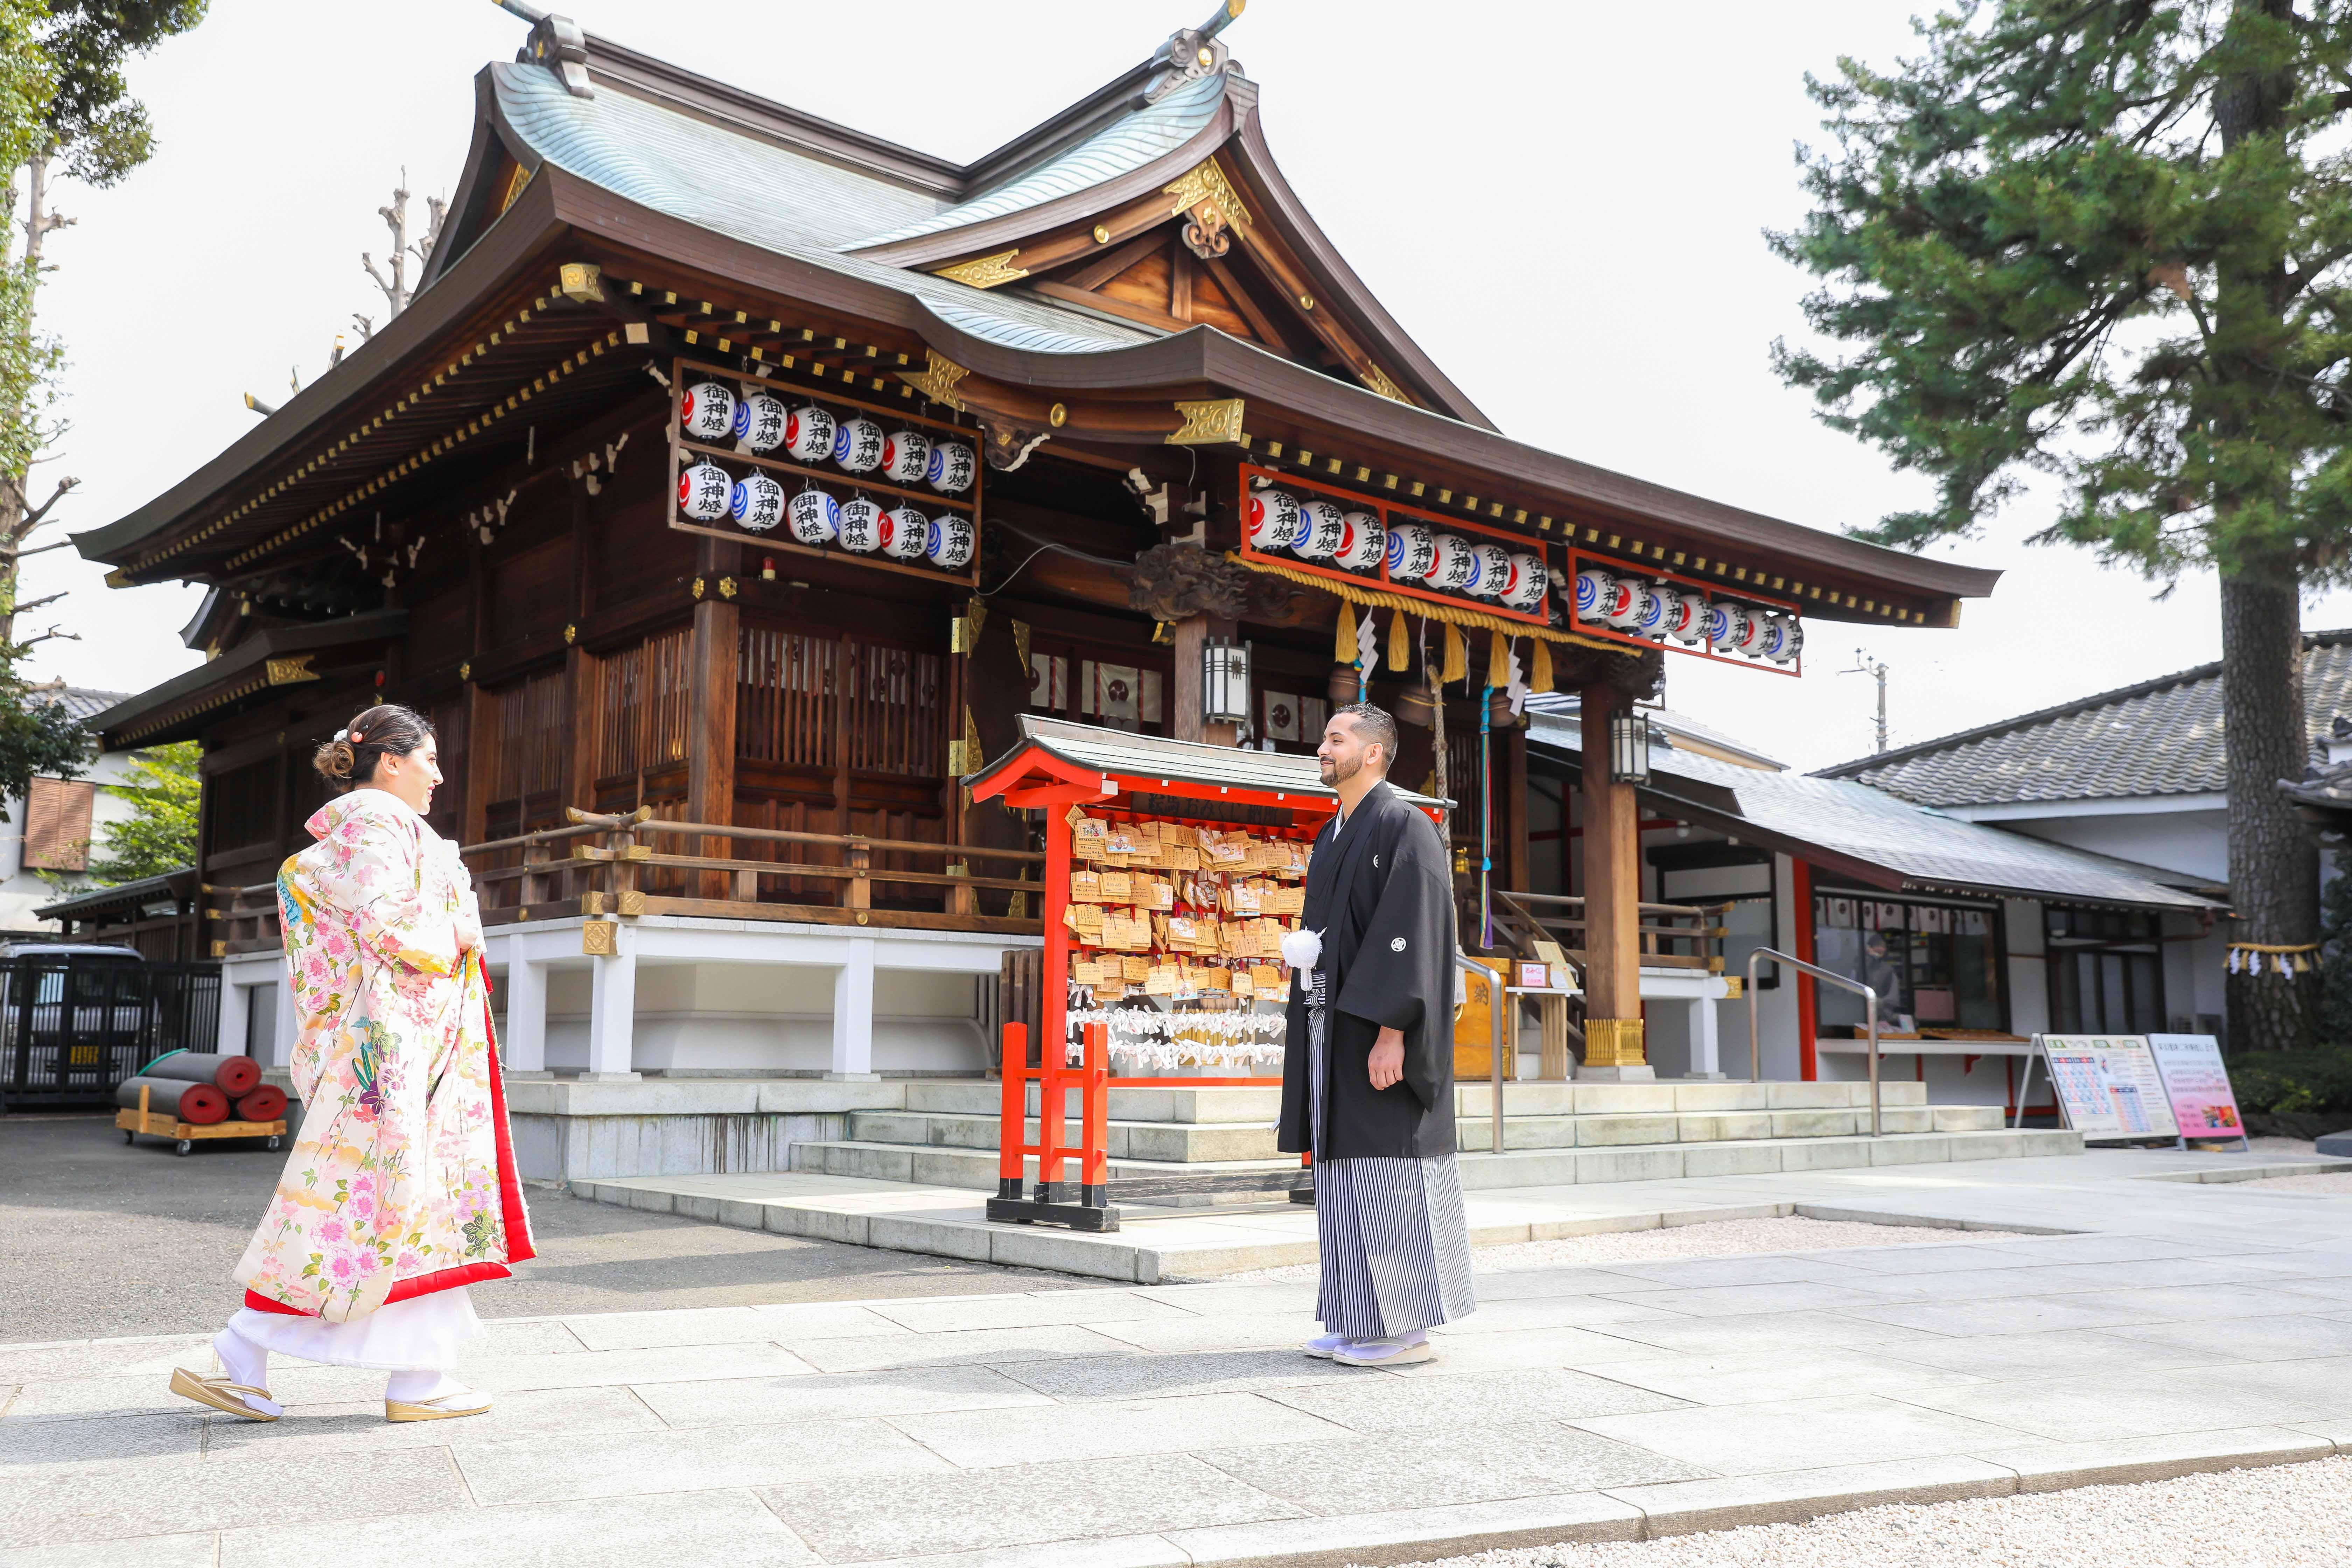 Shinto Shrine Elopement